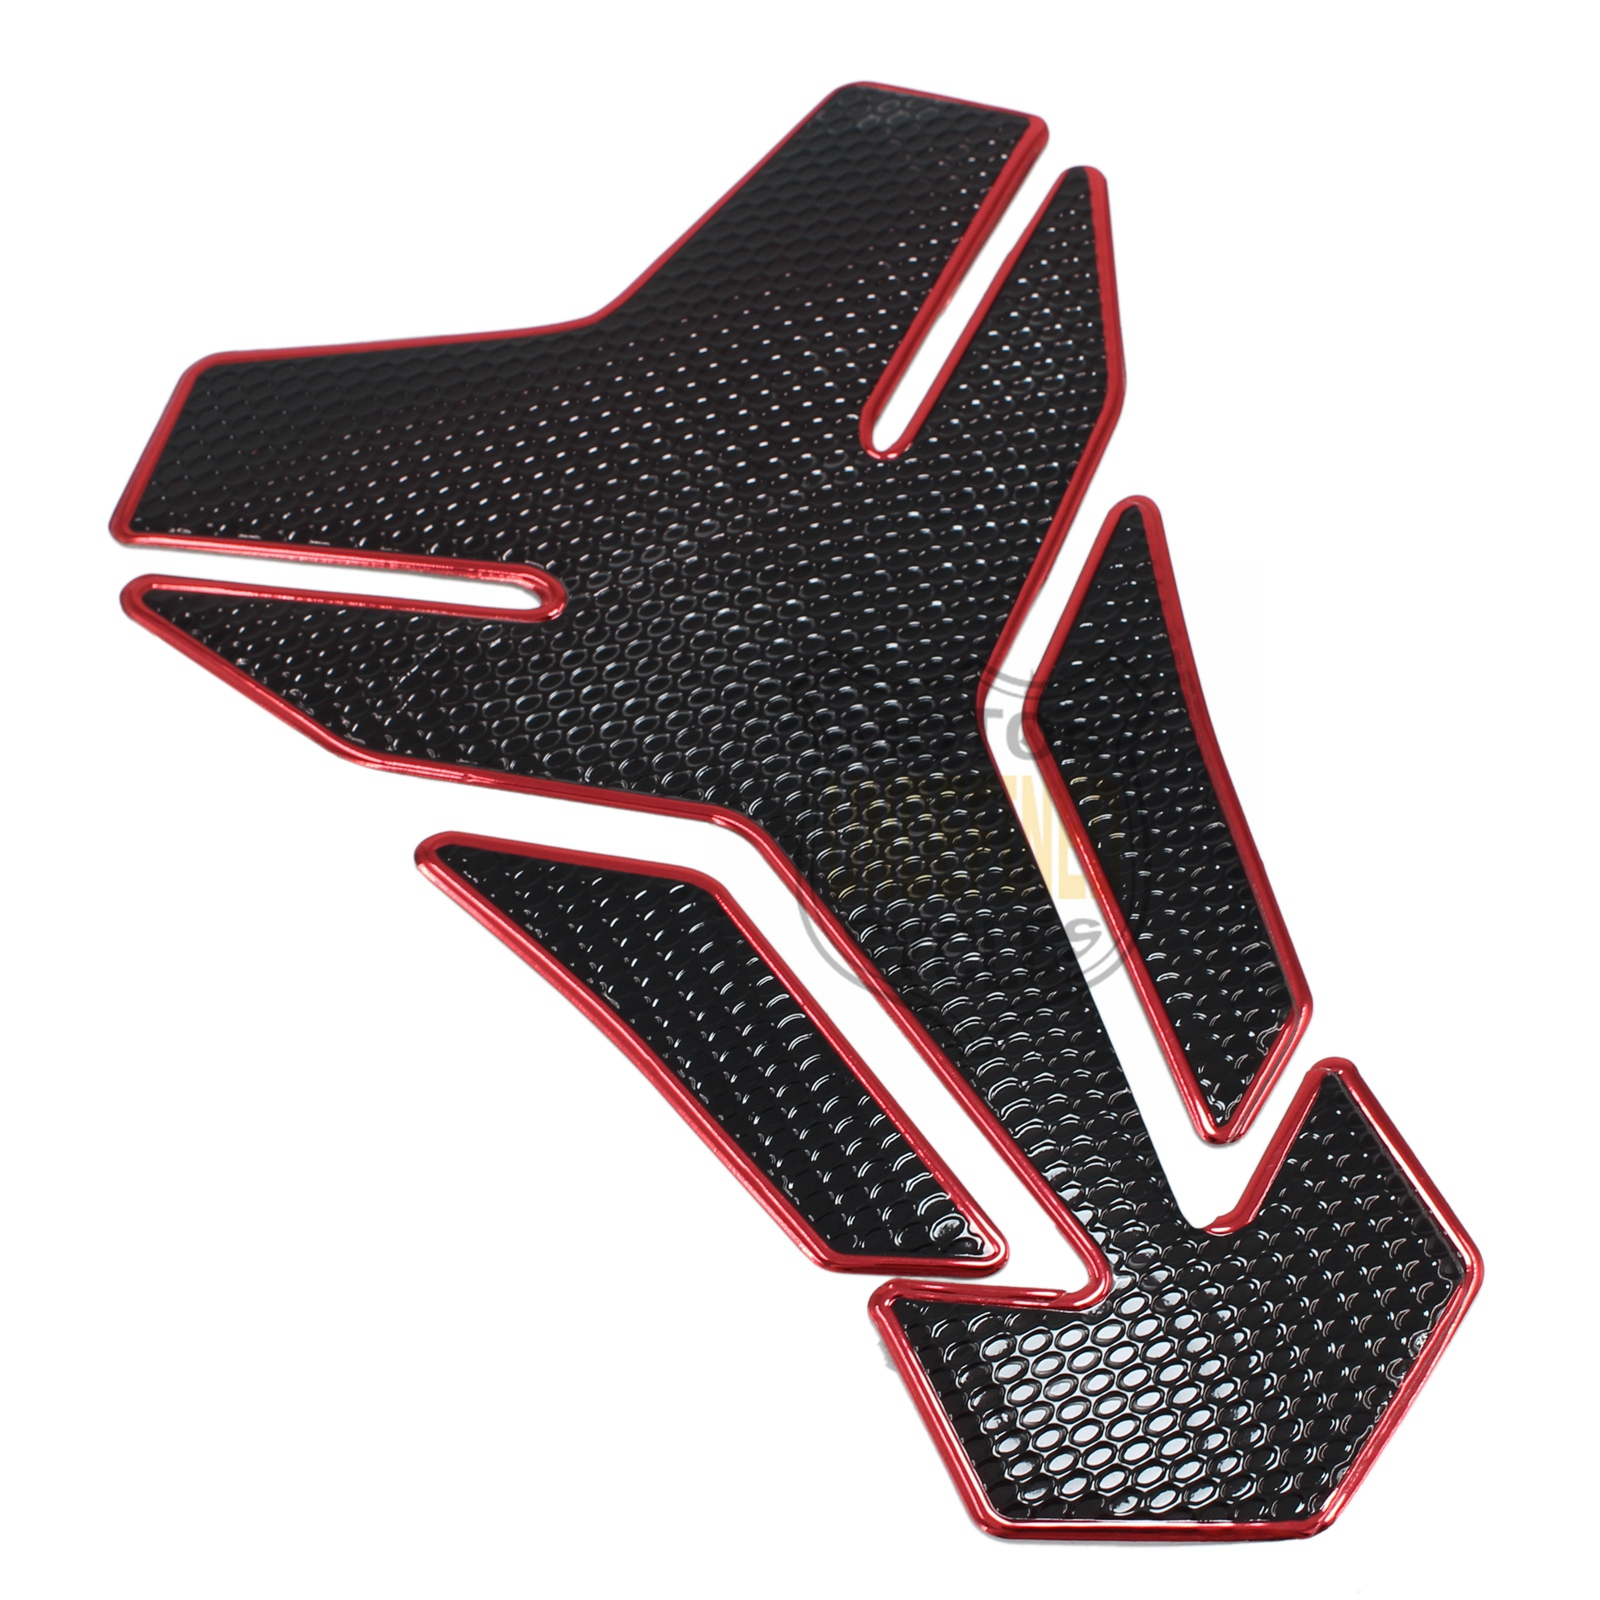 Fit For Yamaha YZF R1 R6 FZ1 R3 TZR 250 FZR FJR1300 Fuel Tank Decals Pad Sticker